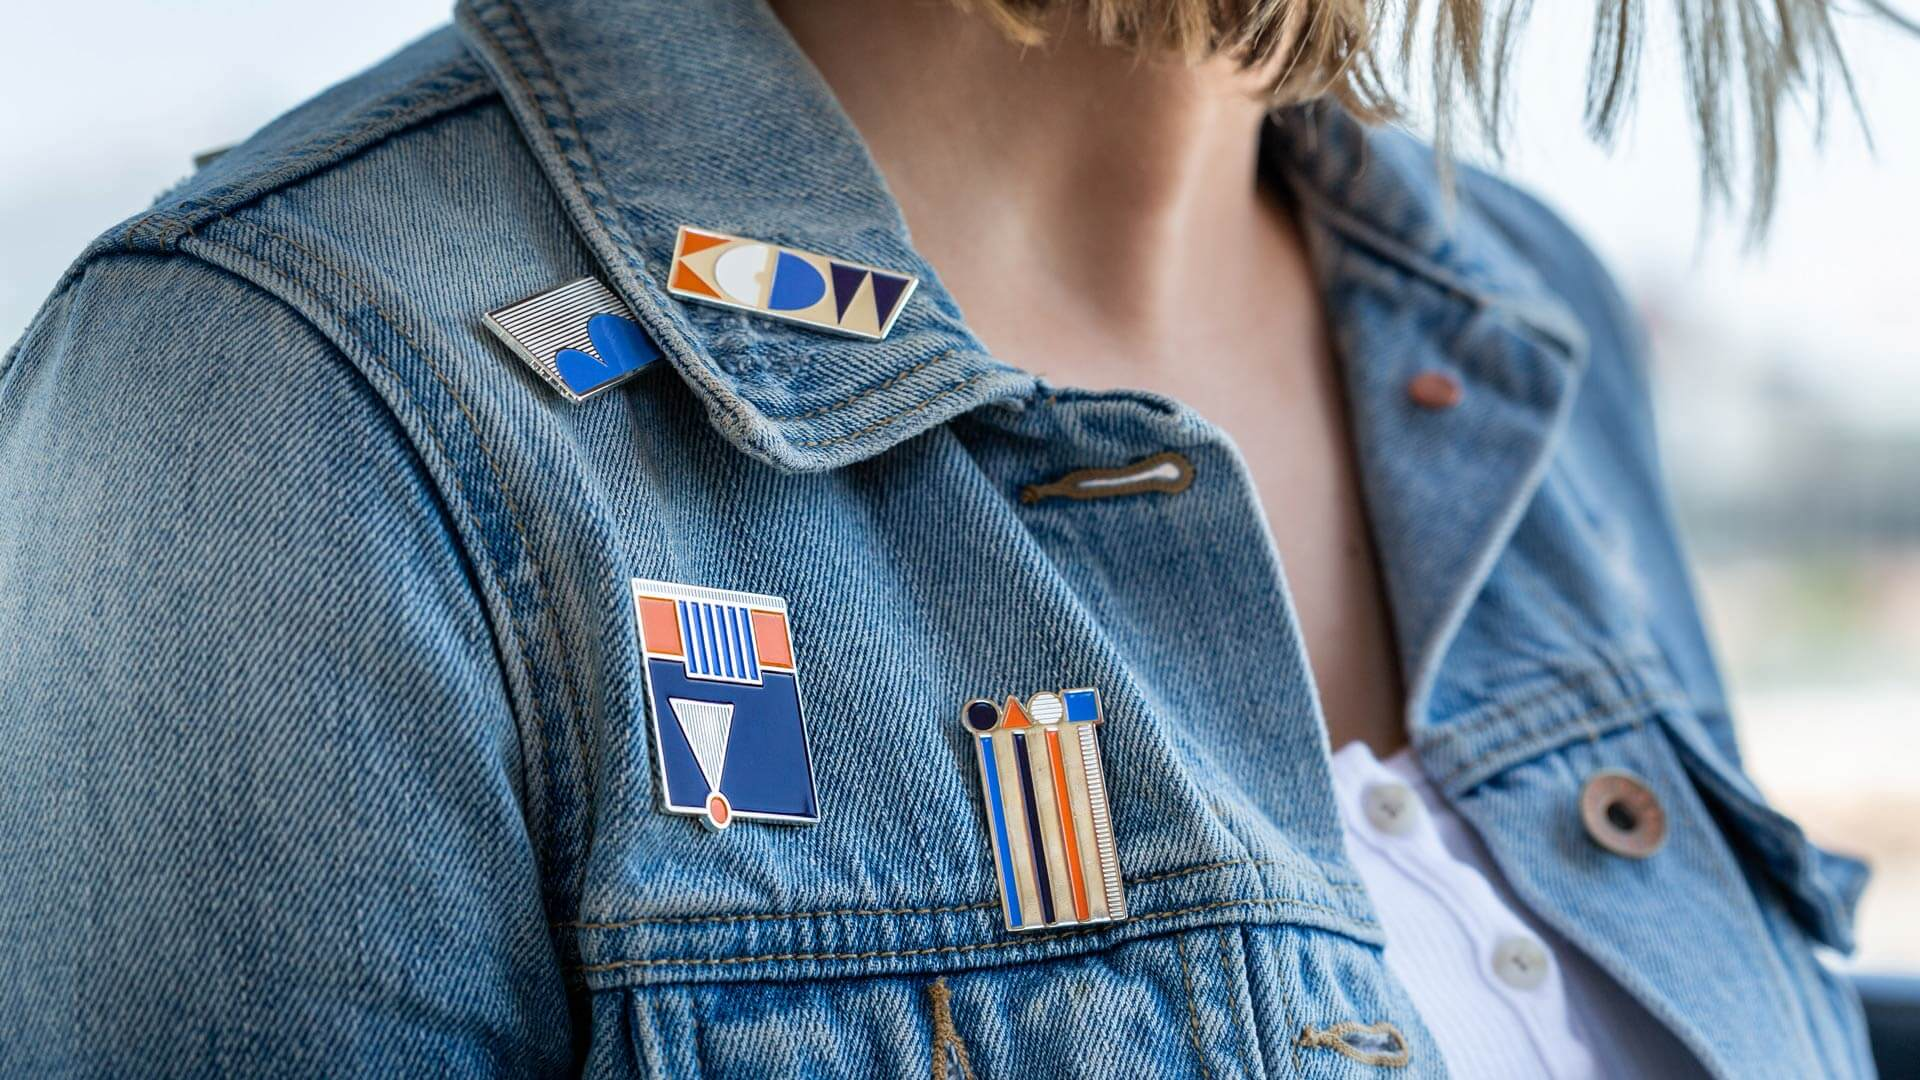 Kansas City Design Week Enamel Pins on Jeans Jacket collar